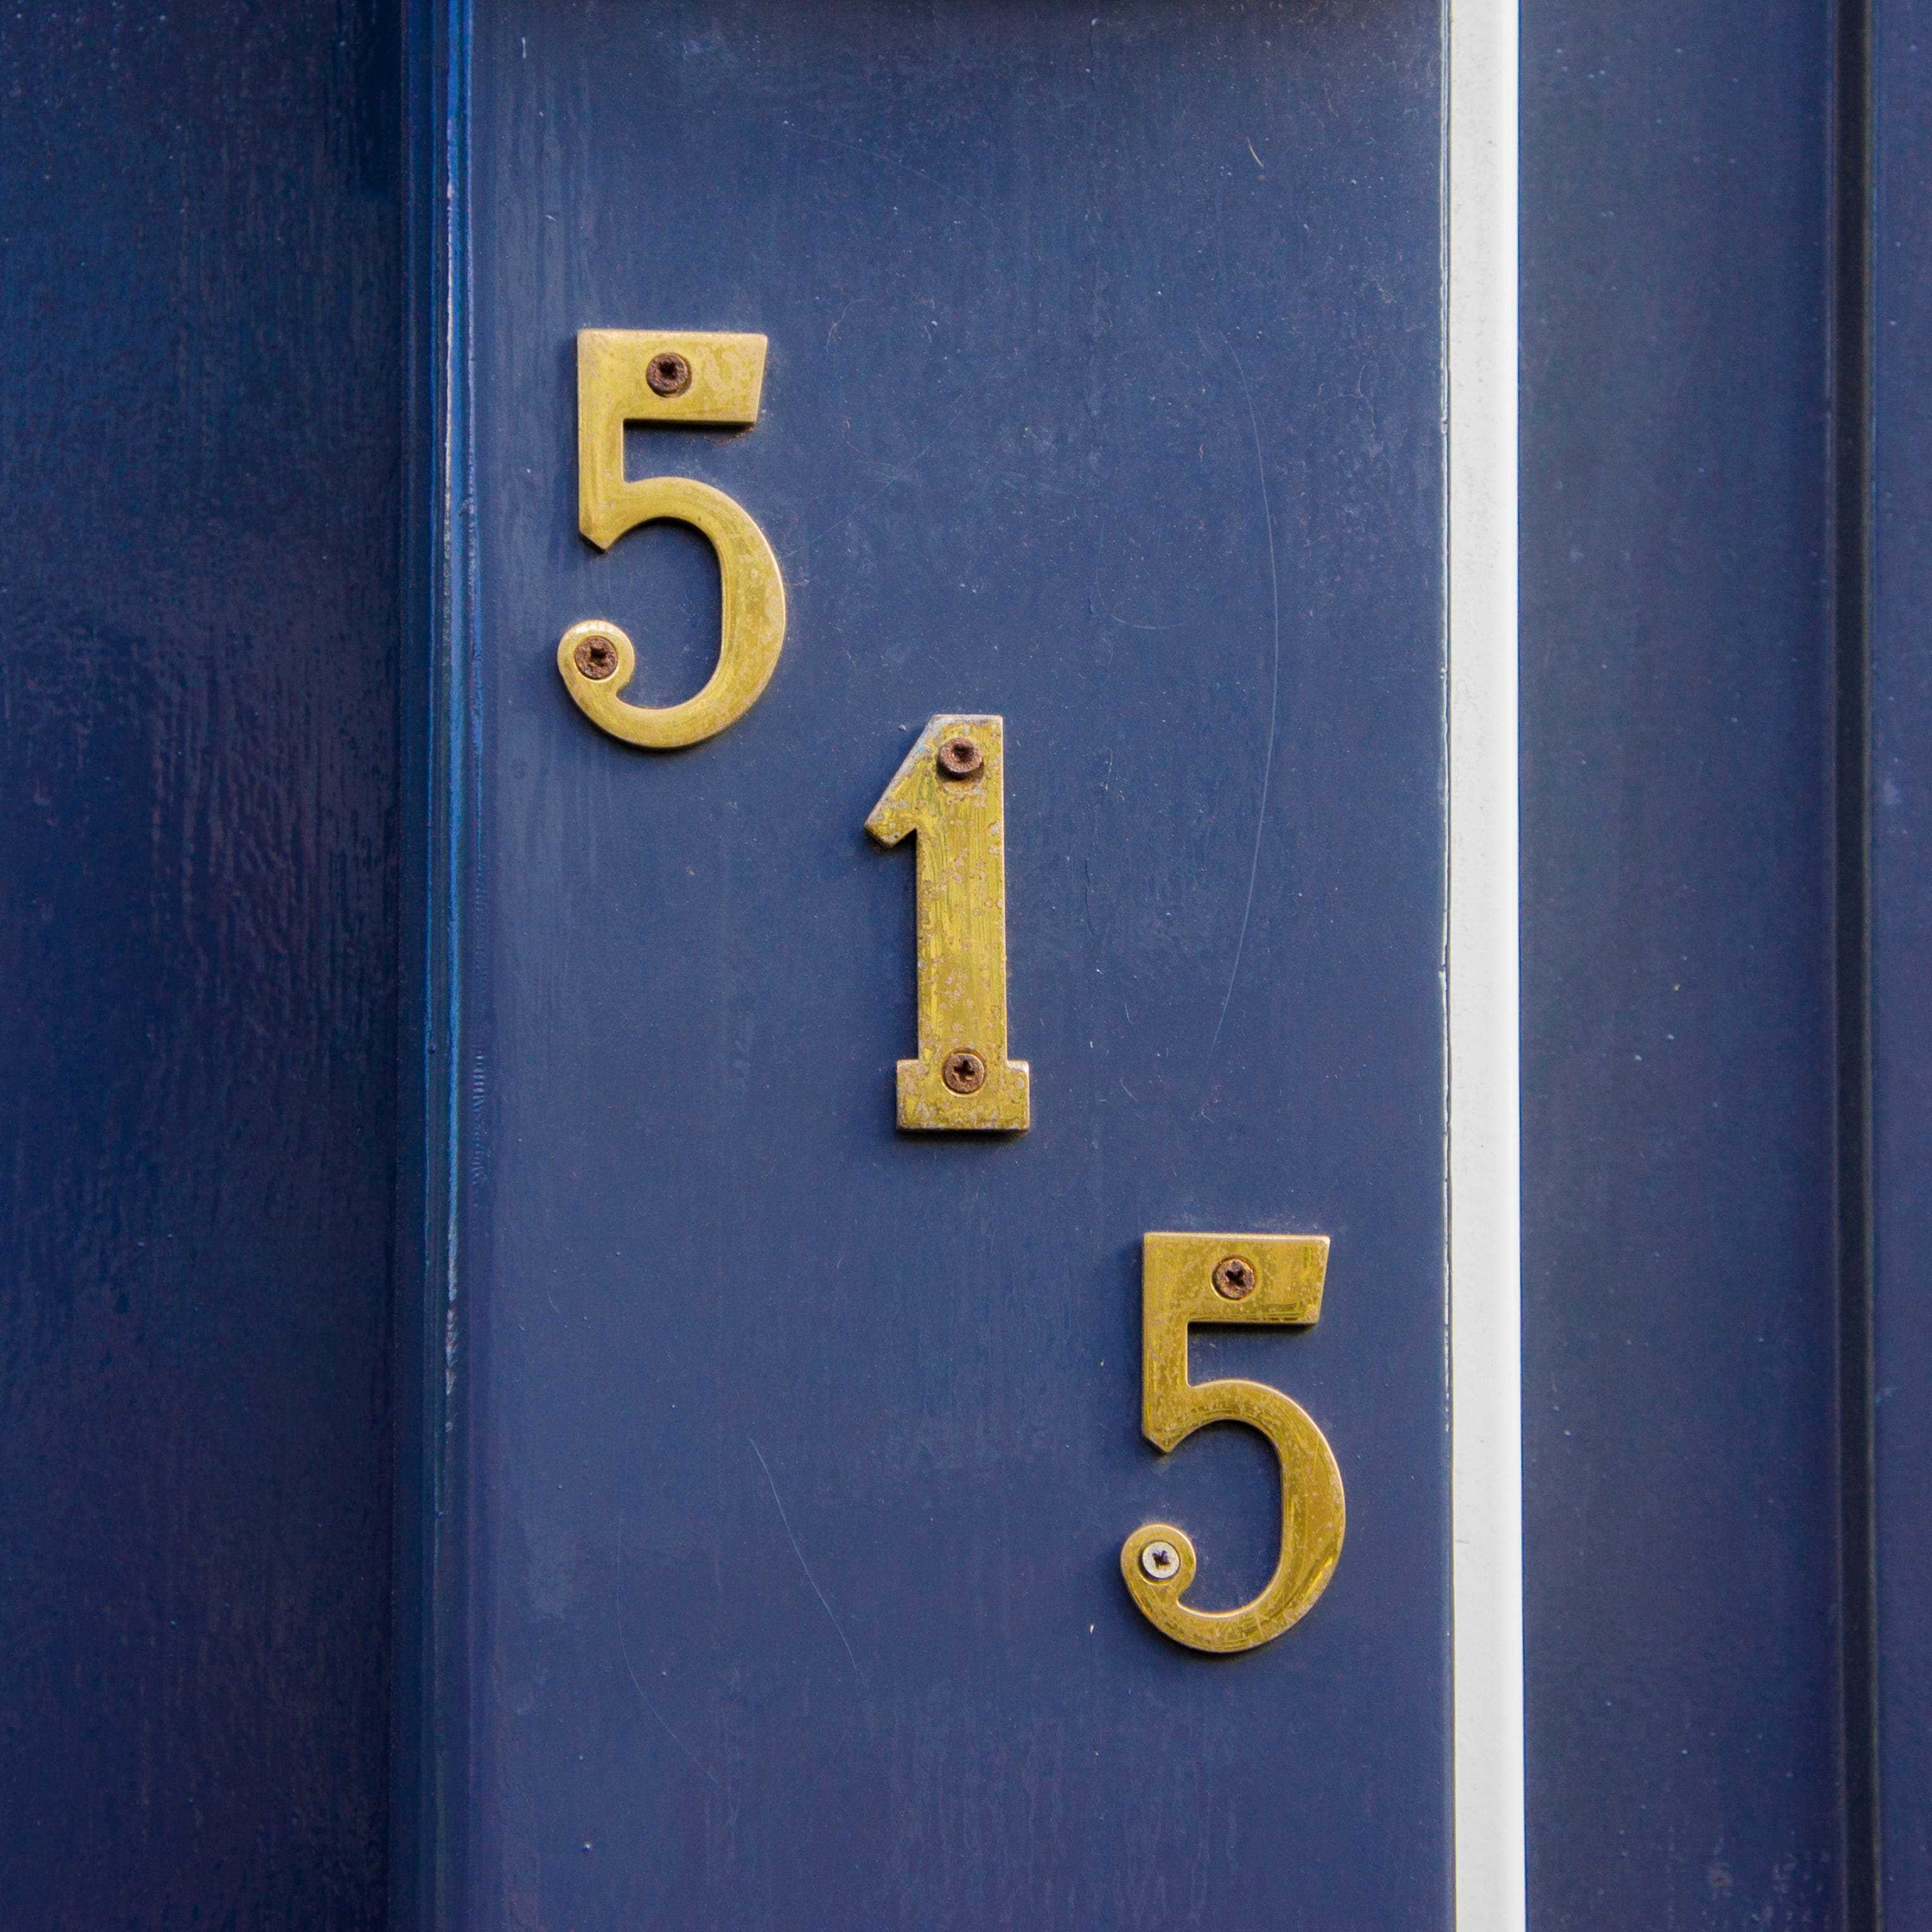 house number displayed on navy blue door trim